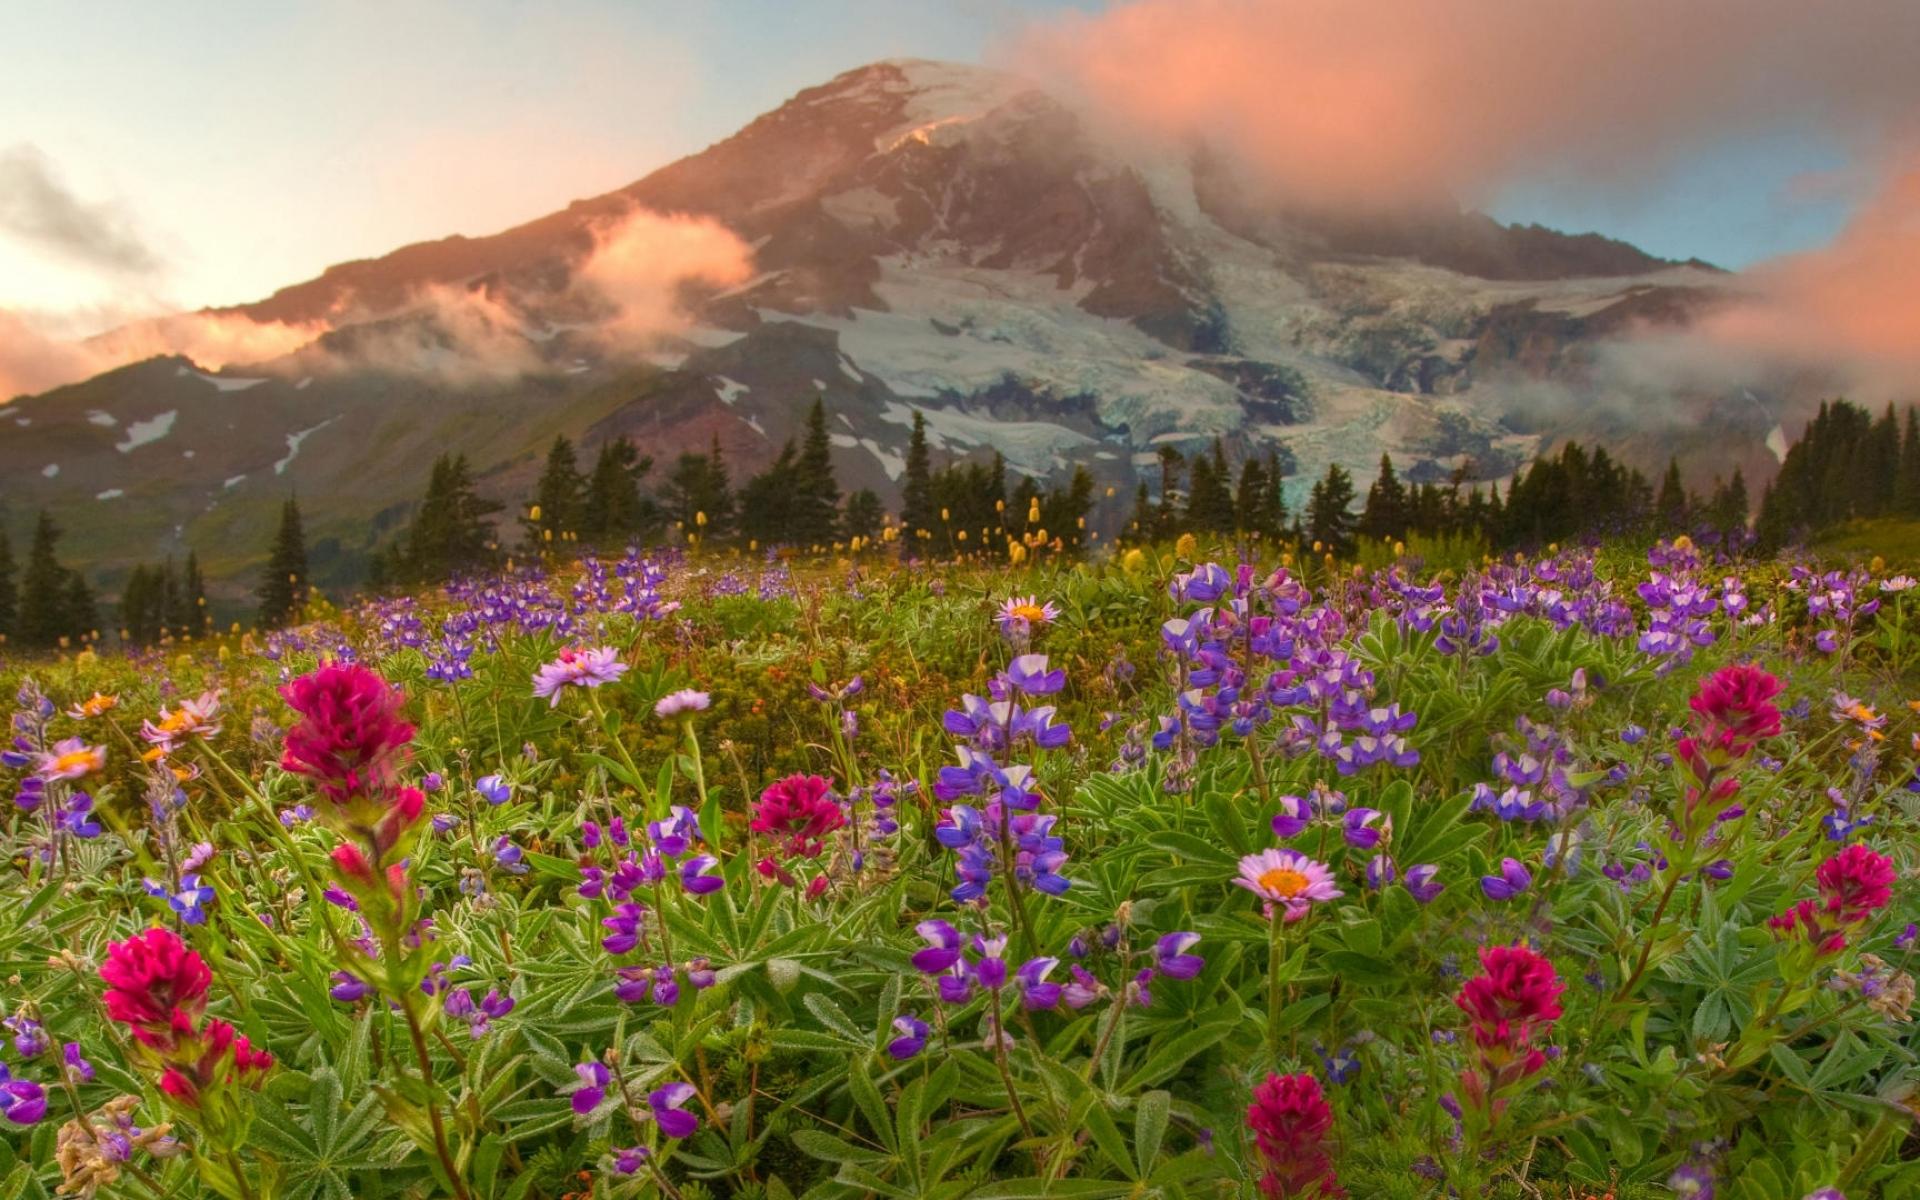 поляна цветы трава холмы горы glade flowers grass hills mountains  № 1829242 бесплатно